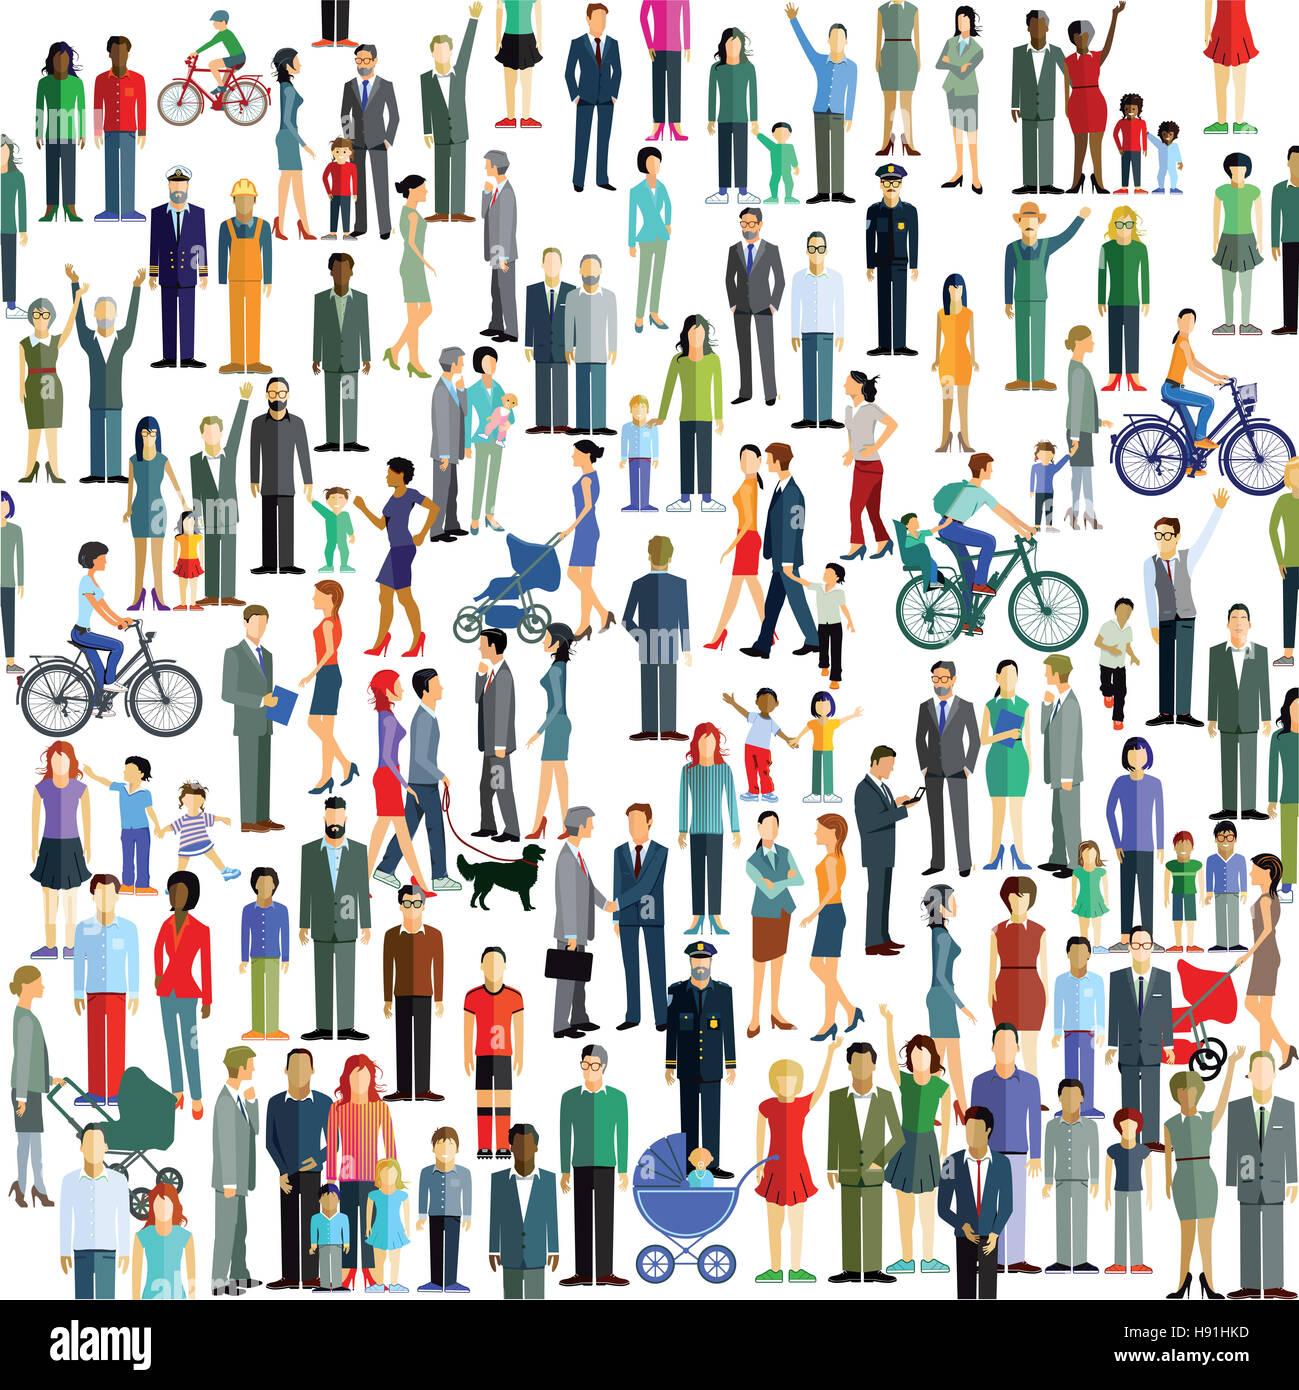 Crowd, community, citizens, residents, parents, children, - Stock Image